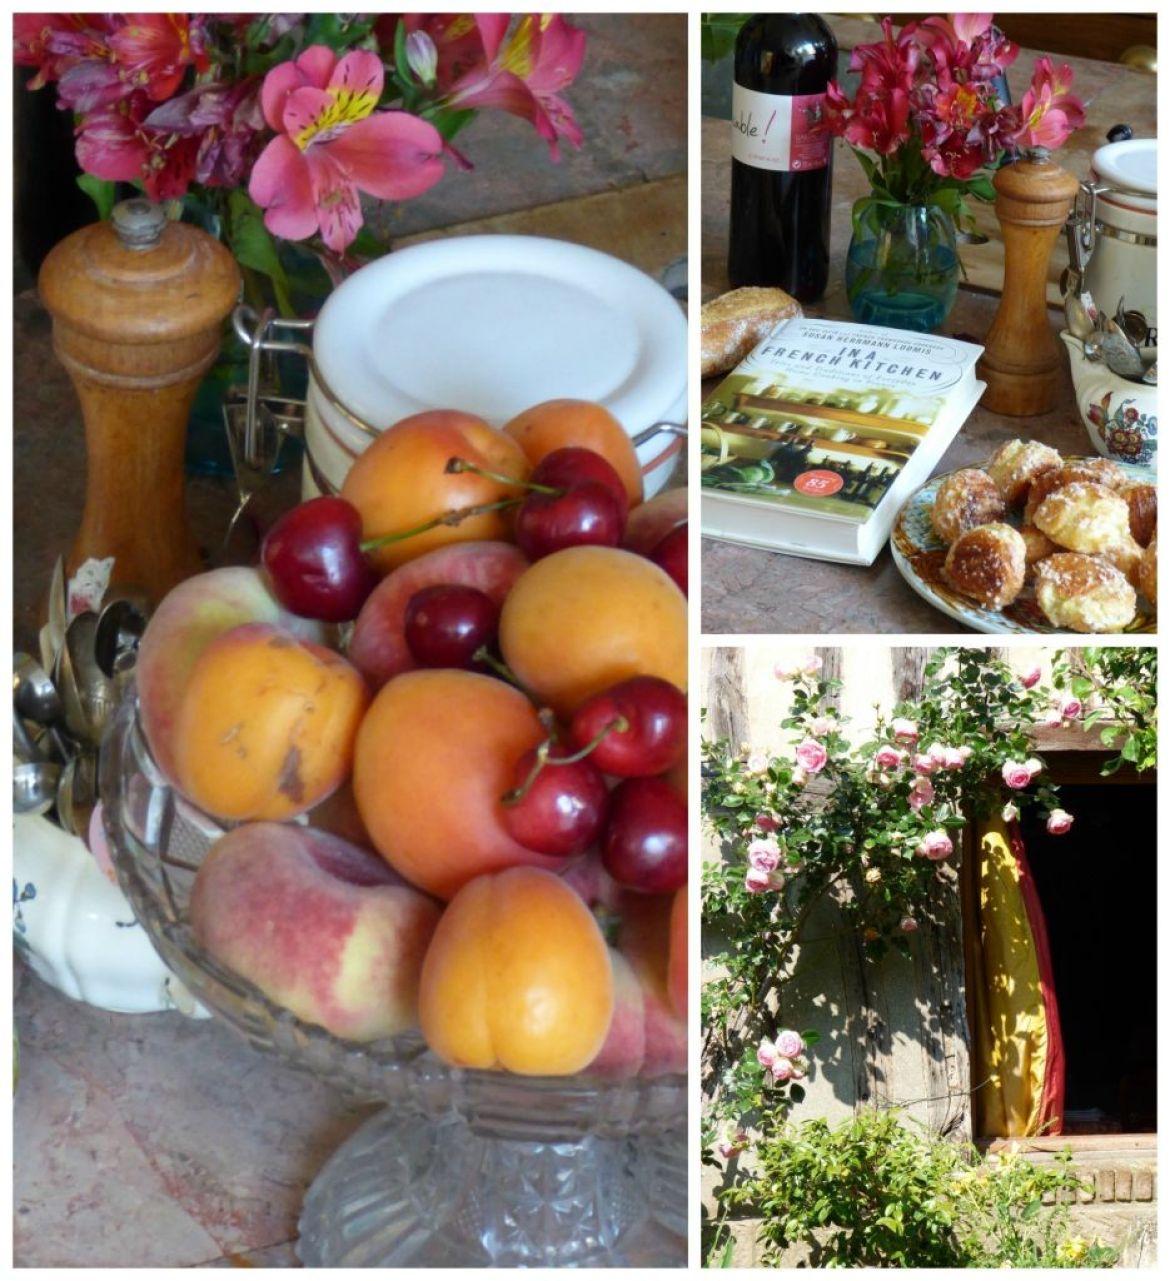 scenes from susan loomis's kitchen